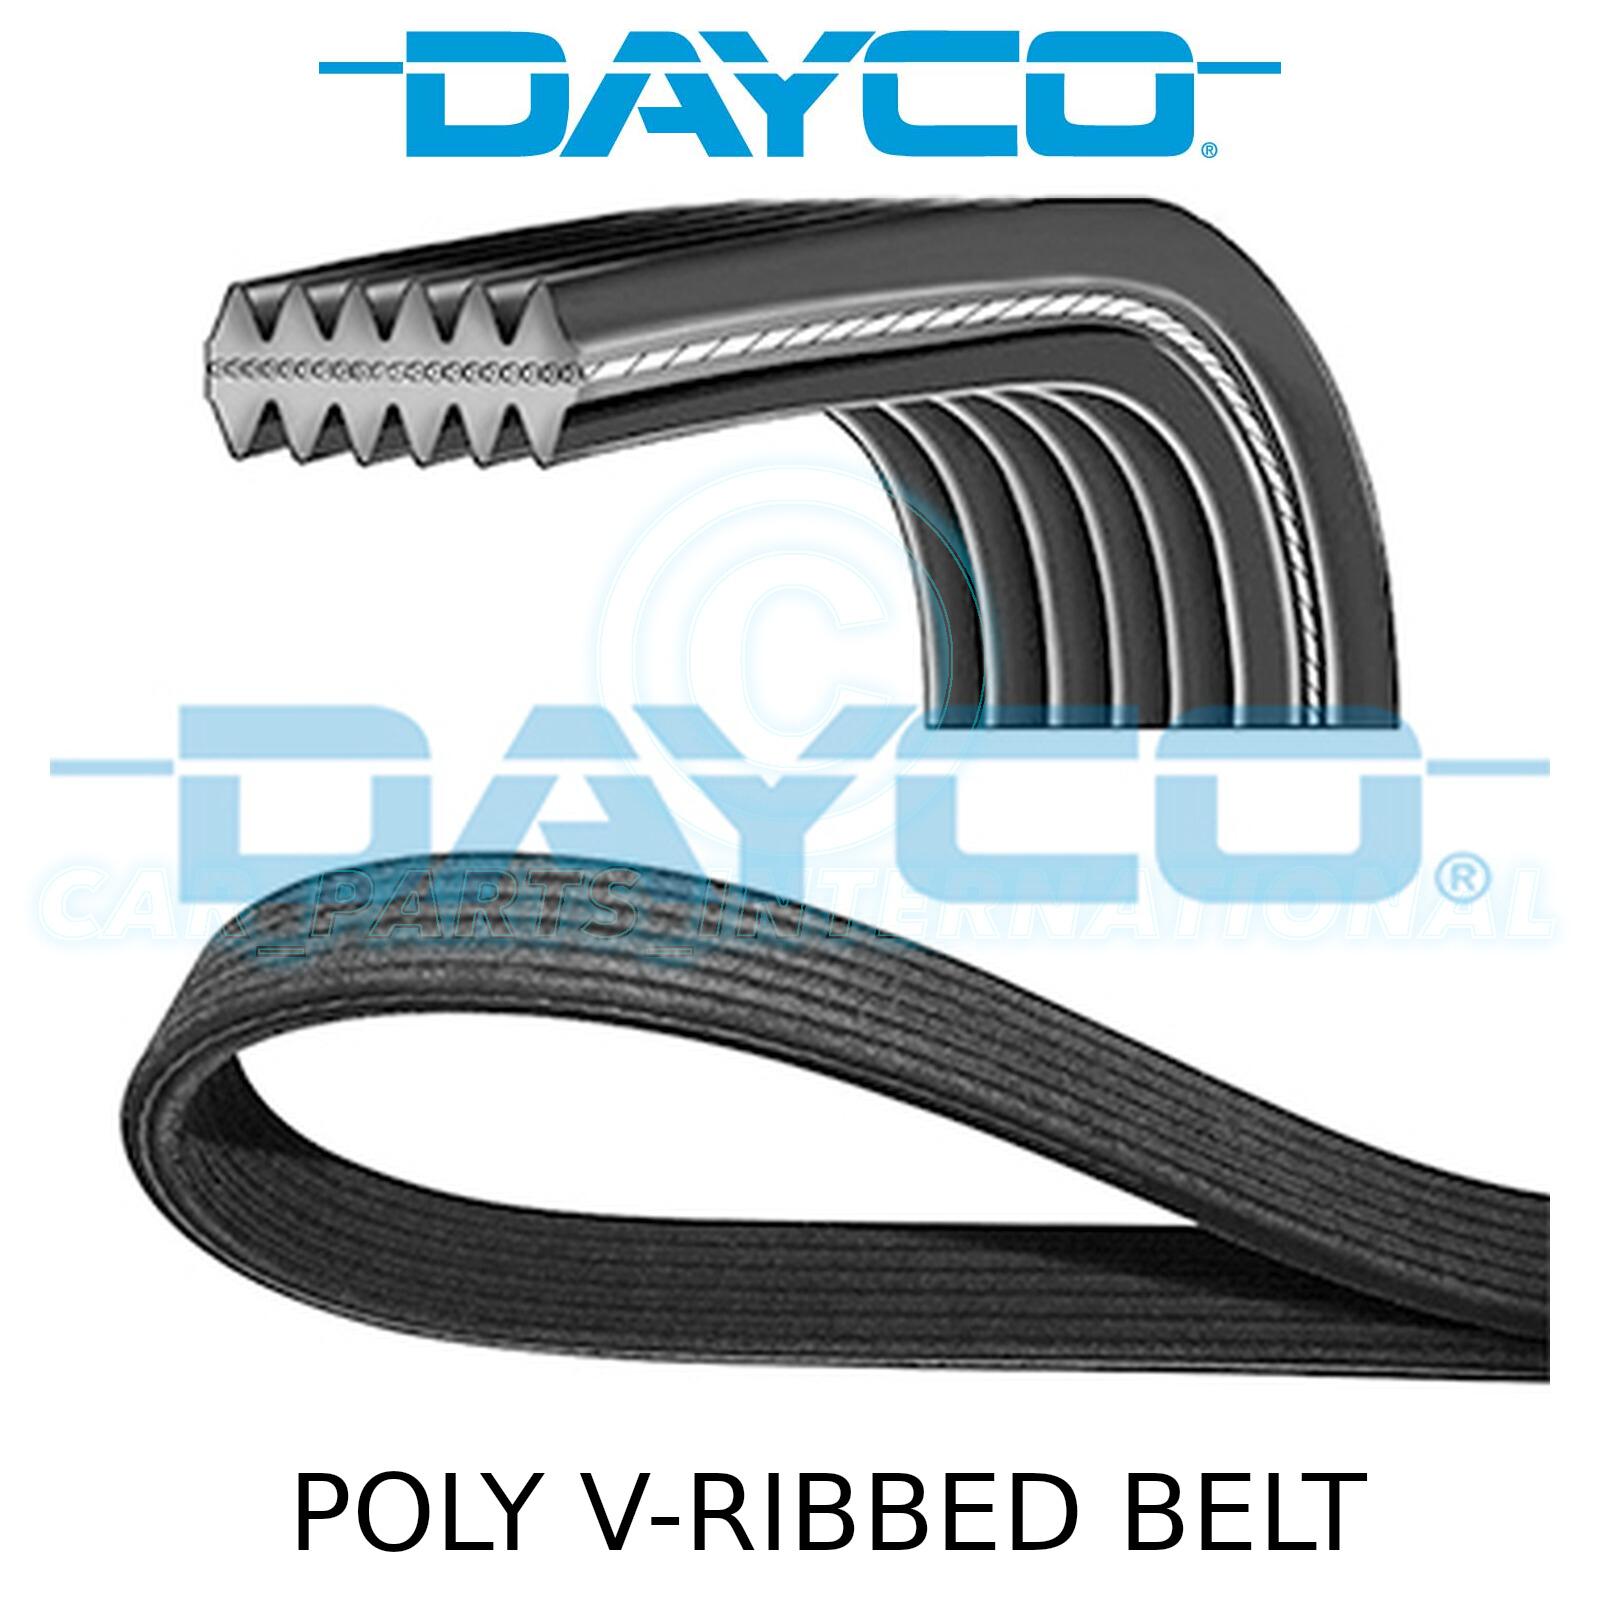 DAYCO Poly-V Ribbed Belt 6 Ribs 1575mm 6PK1575 Auxiliary Fan Drive Alternator